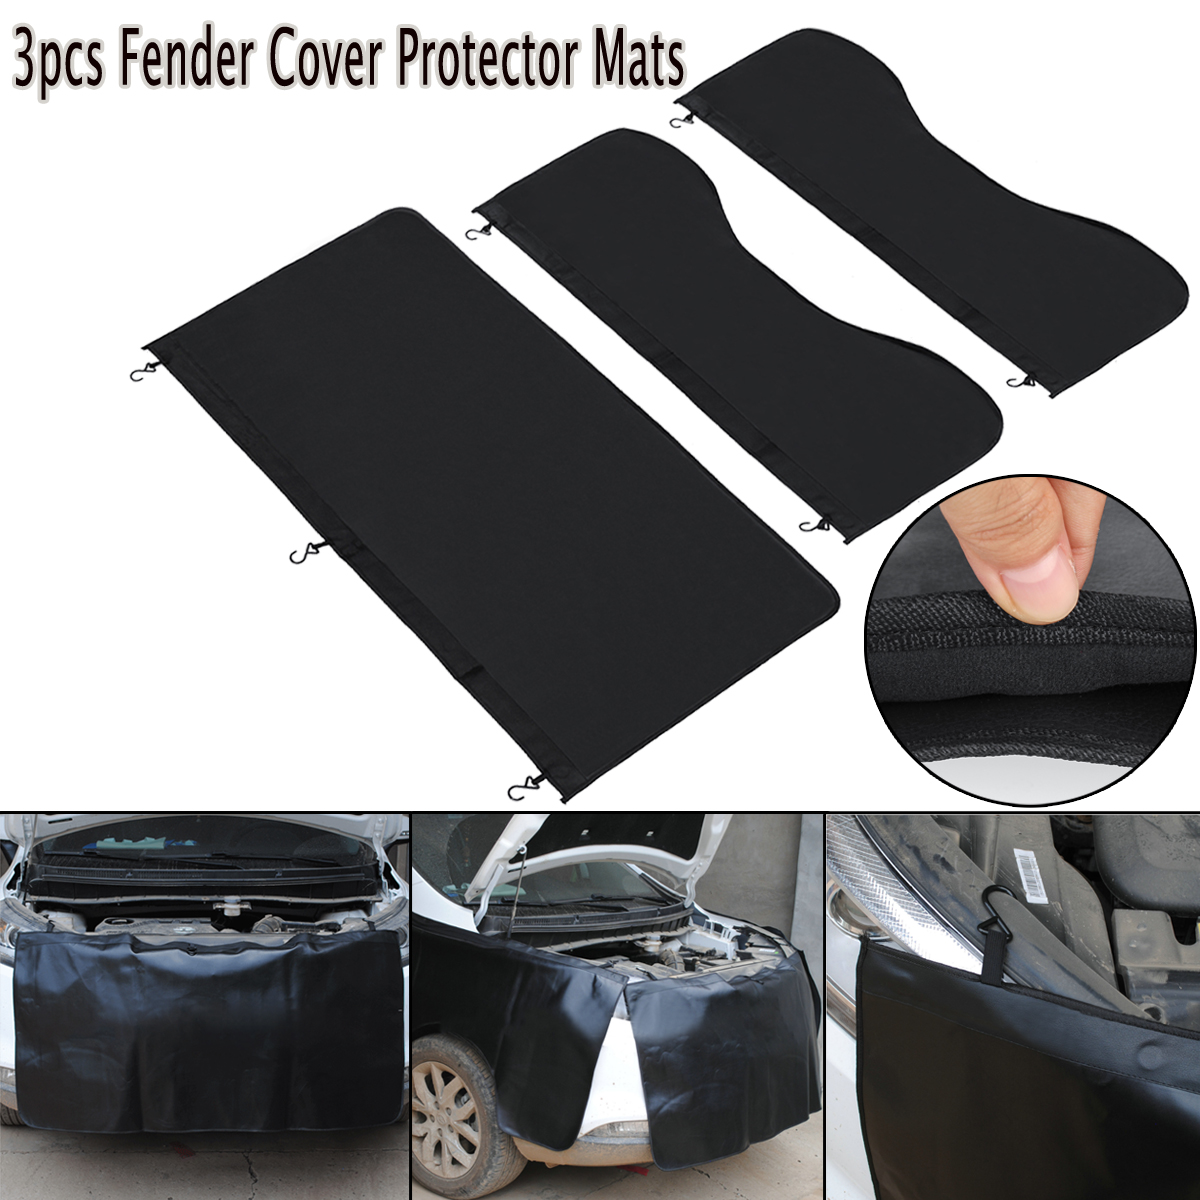 3pcs Universal Car Magnetic Fender Cover Protector Mechanic Work Mat Auto Repairing Pad Car Covers    - AliExpress